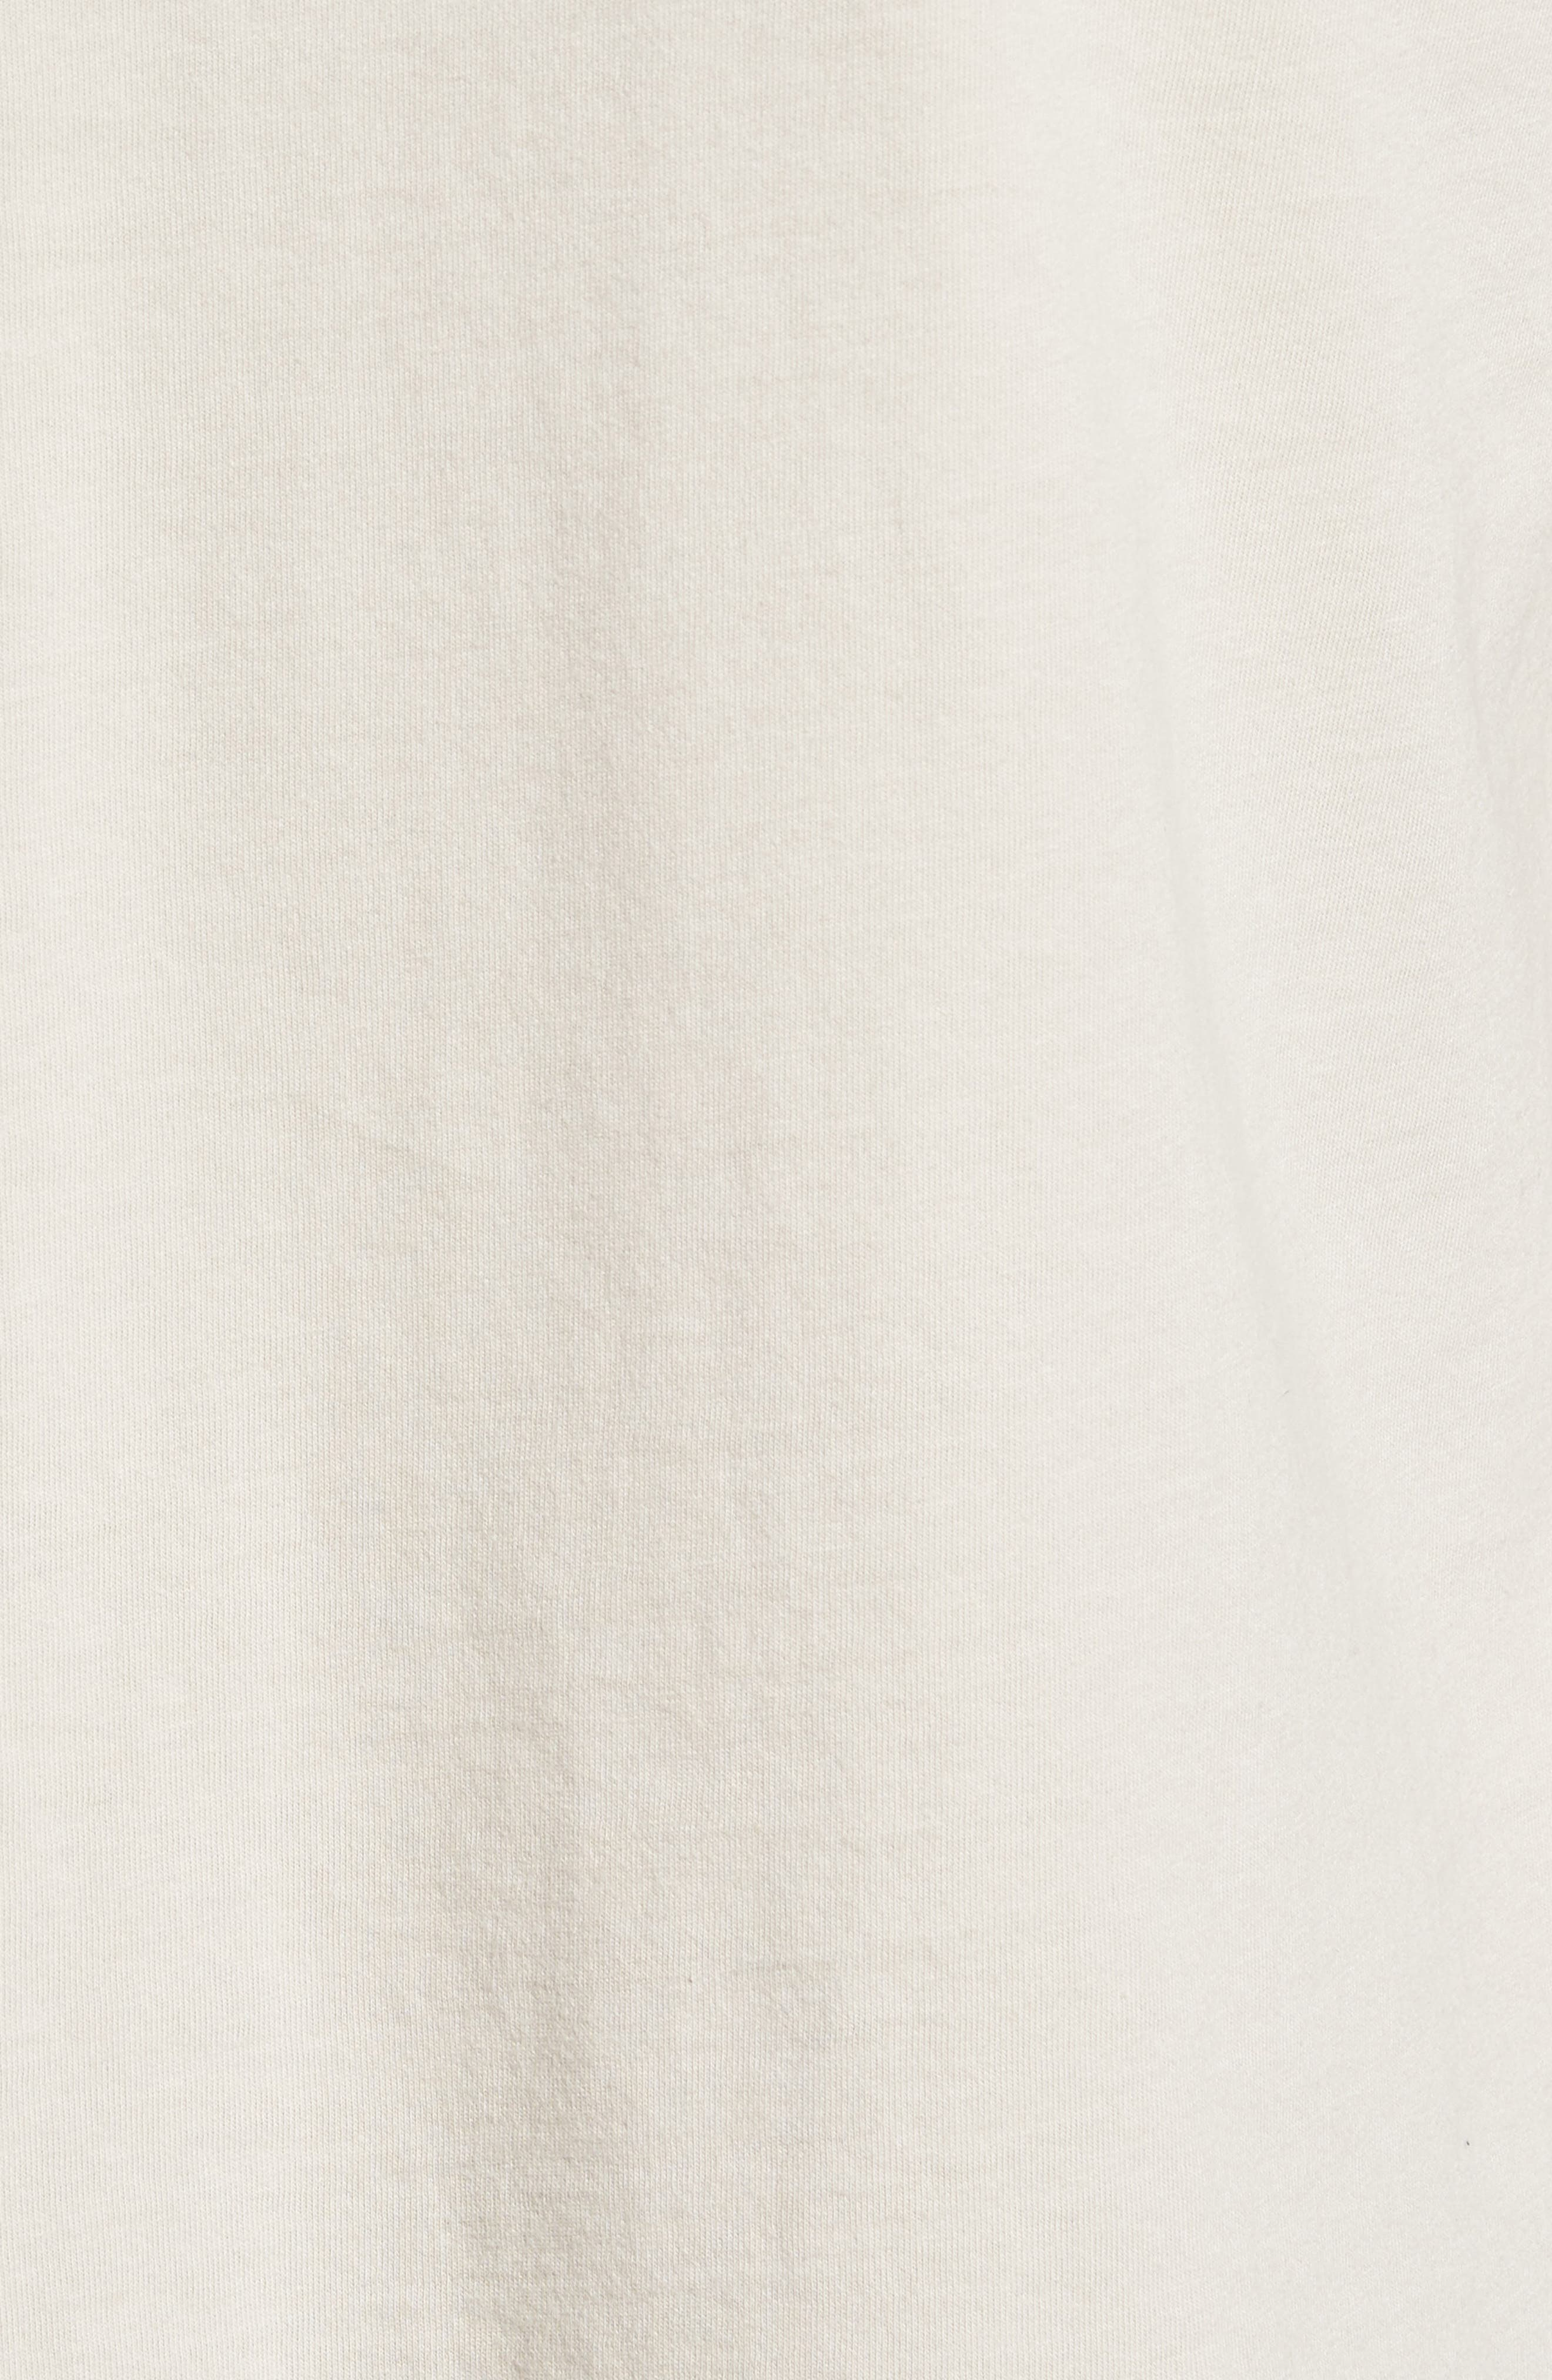 Maron Long Sleeve T-Shirt,                             Alternate thumbnail 5, color,                             020